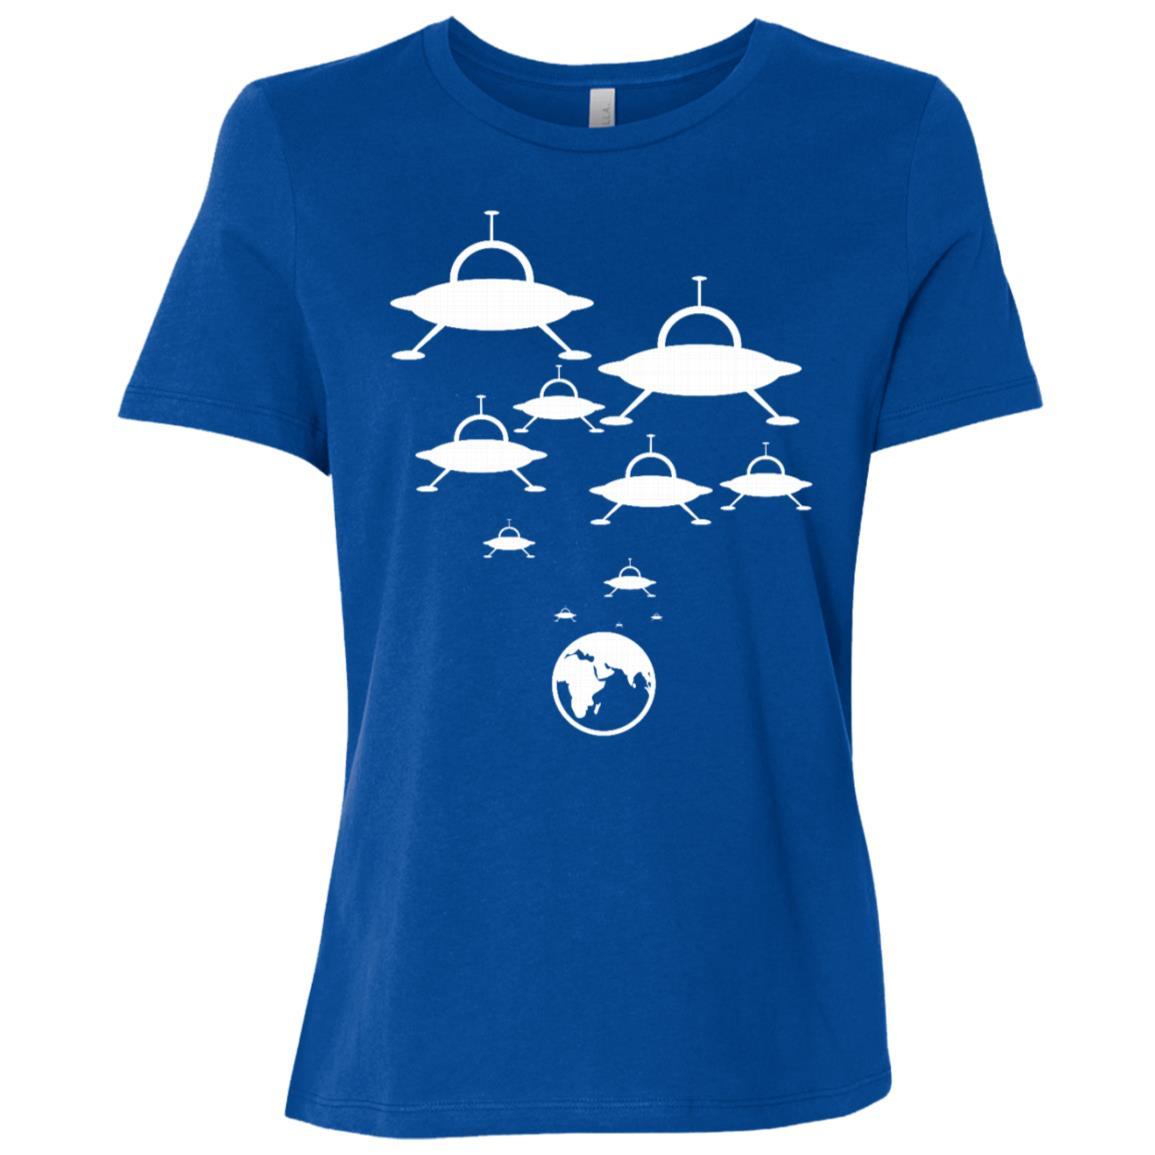 Alien Spaceships Landing On The Earth Ufo Funny Women Short Sleeve T-Shirt